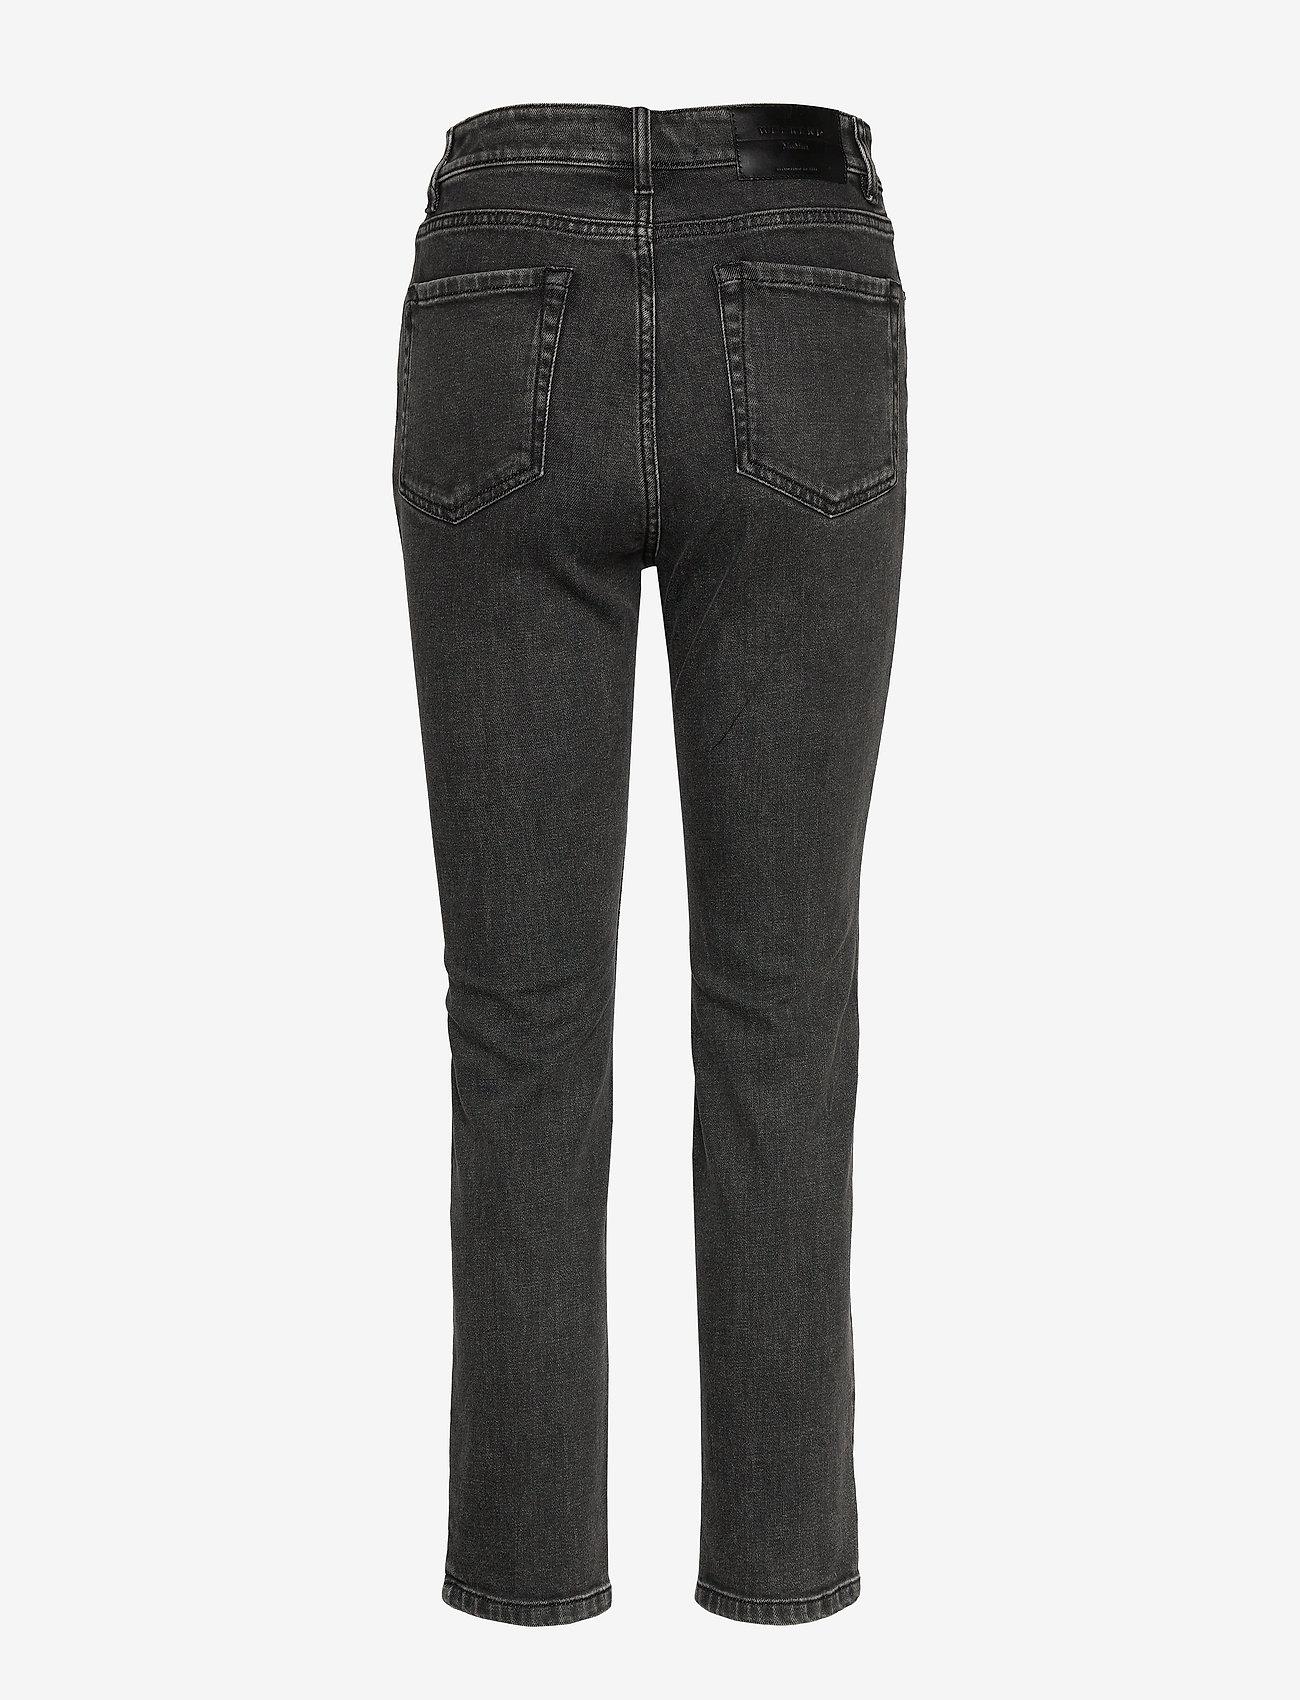 Weekend Max Mara - FINANZA - slim jeans - black - 1